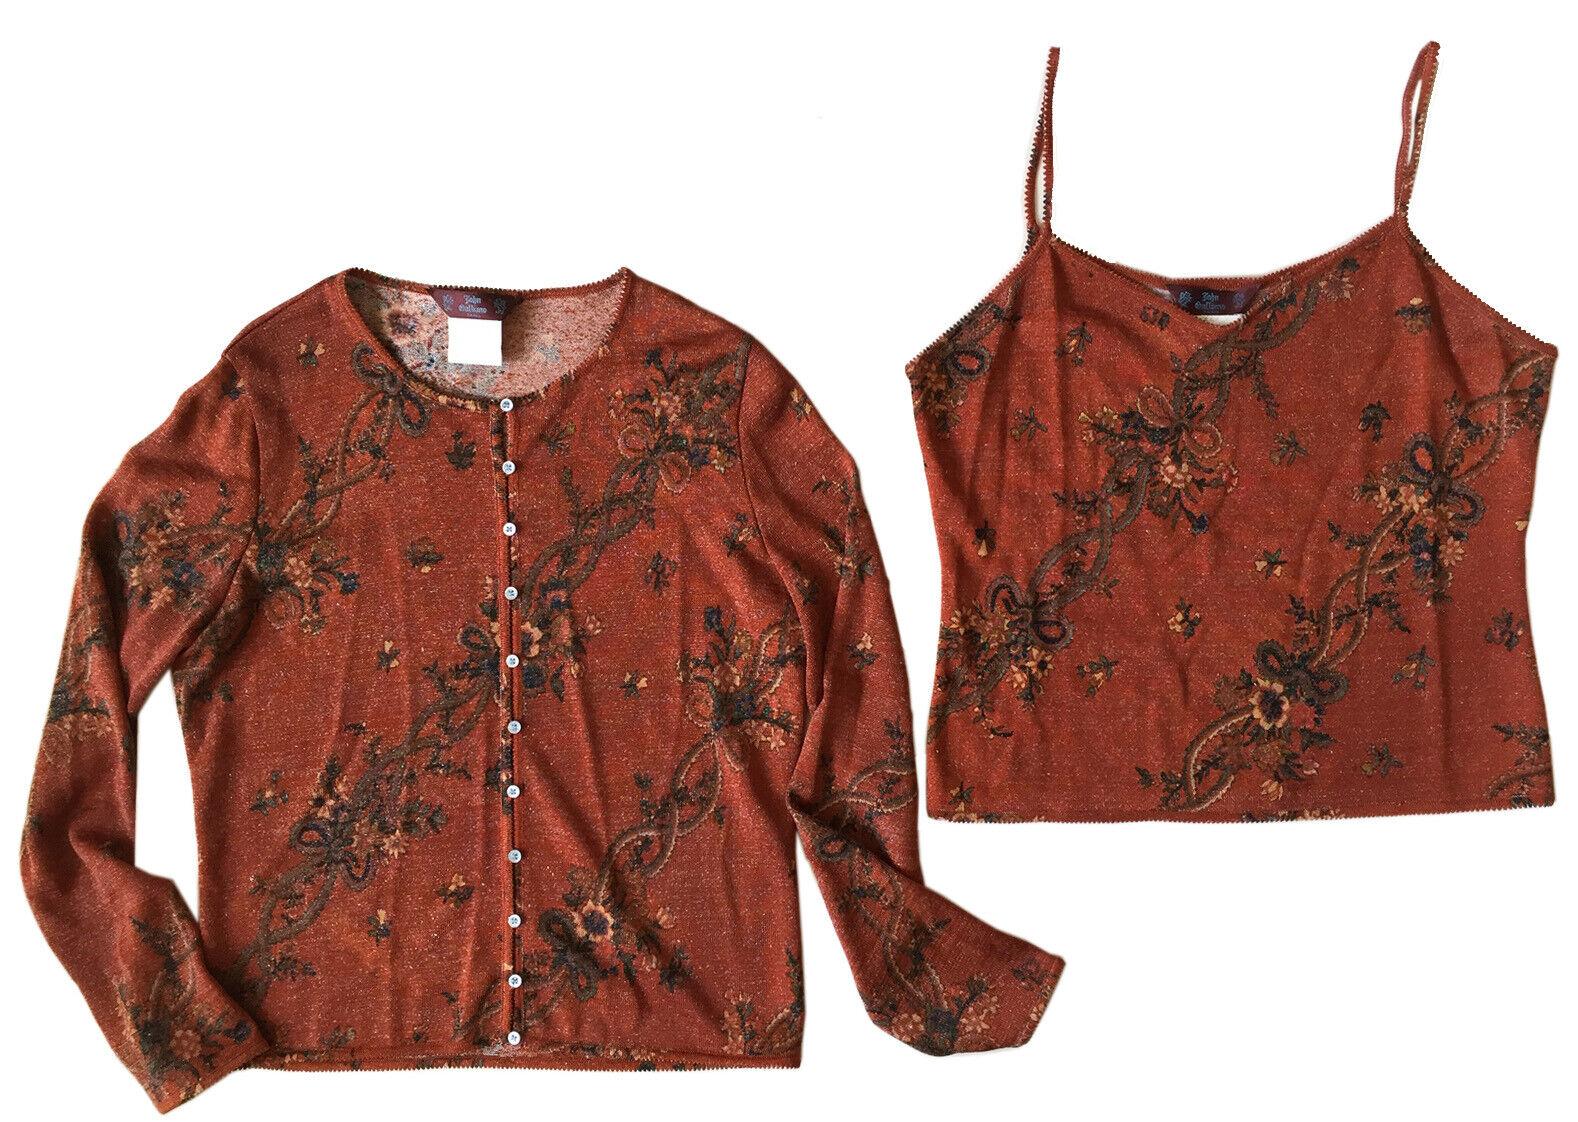 JOHN GALLIANO Knit 2-Pc Sweater Set Rust Floral Sparkle Sz L Cardigan & Tank Top